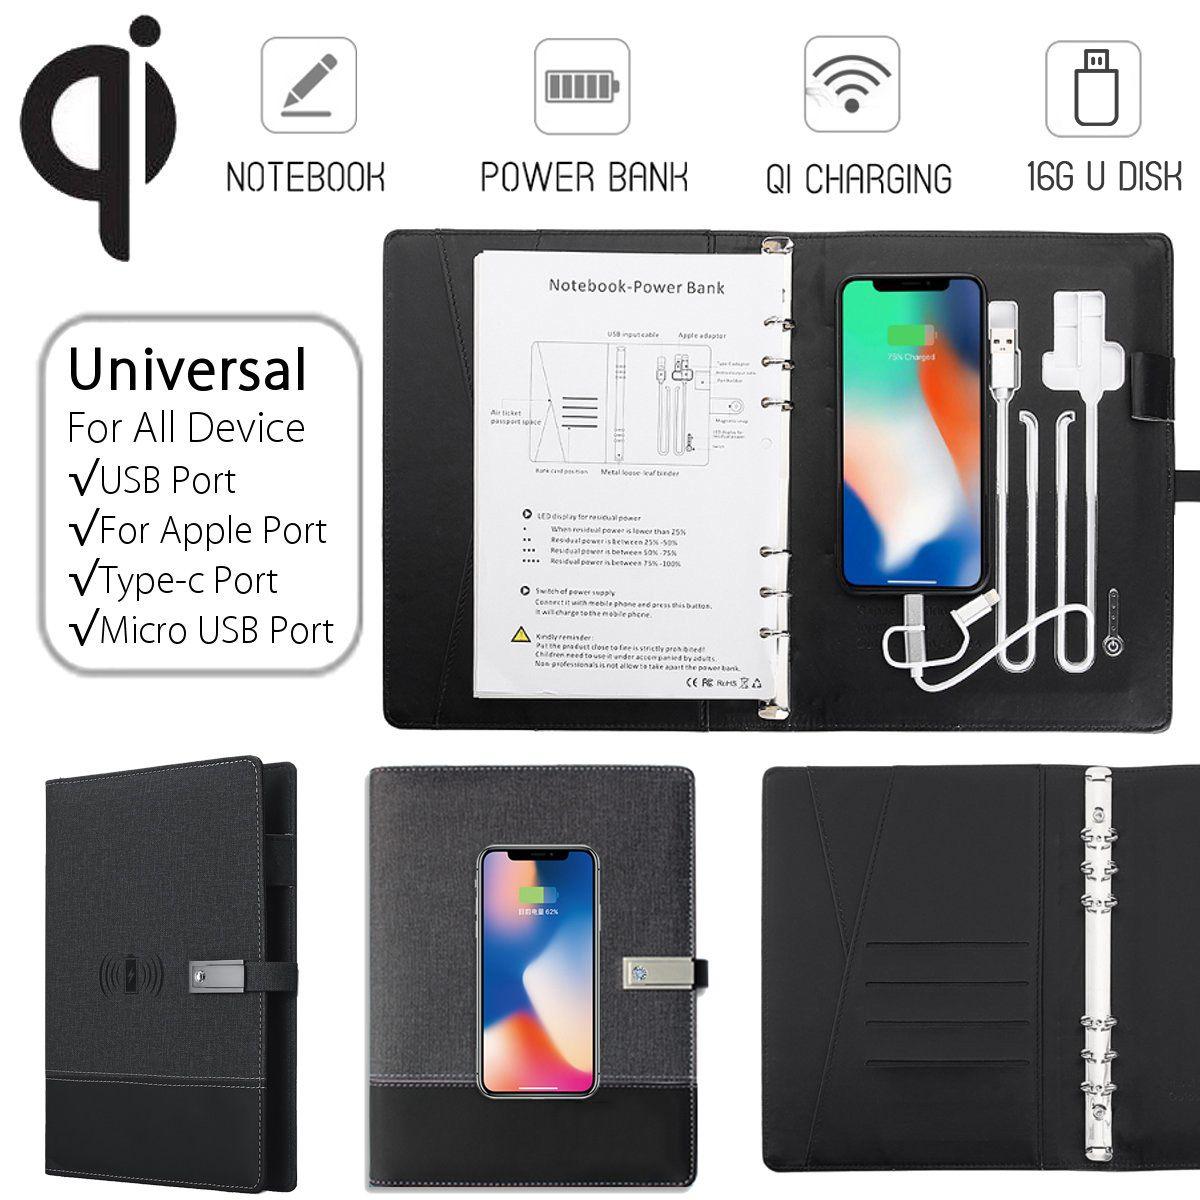 Qi de Carregamento Sem Fio de Multi Funcional Note Book Notebook Banco de Potência 8000 mAh Banco De Potência Binder Spiral Diary Book + USB disco Flash